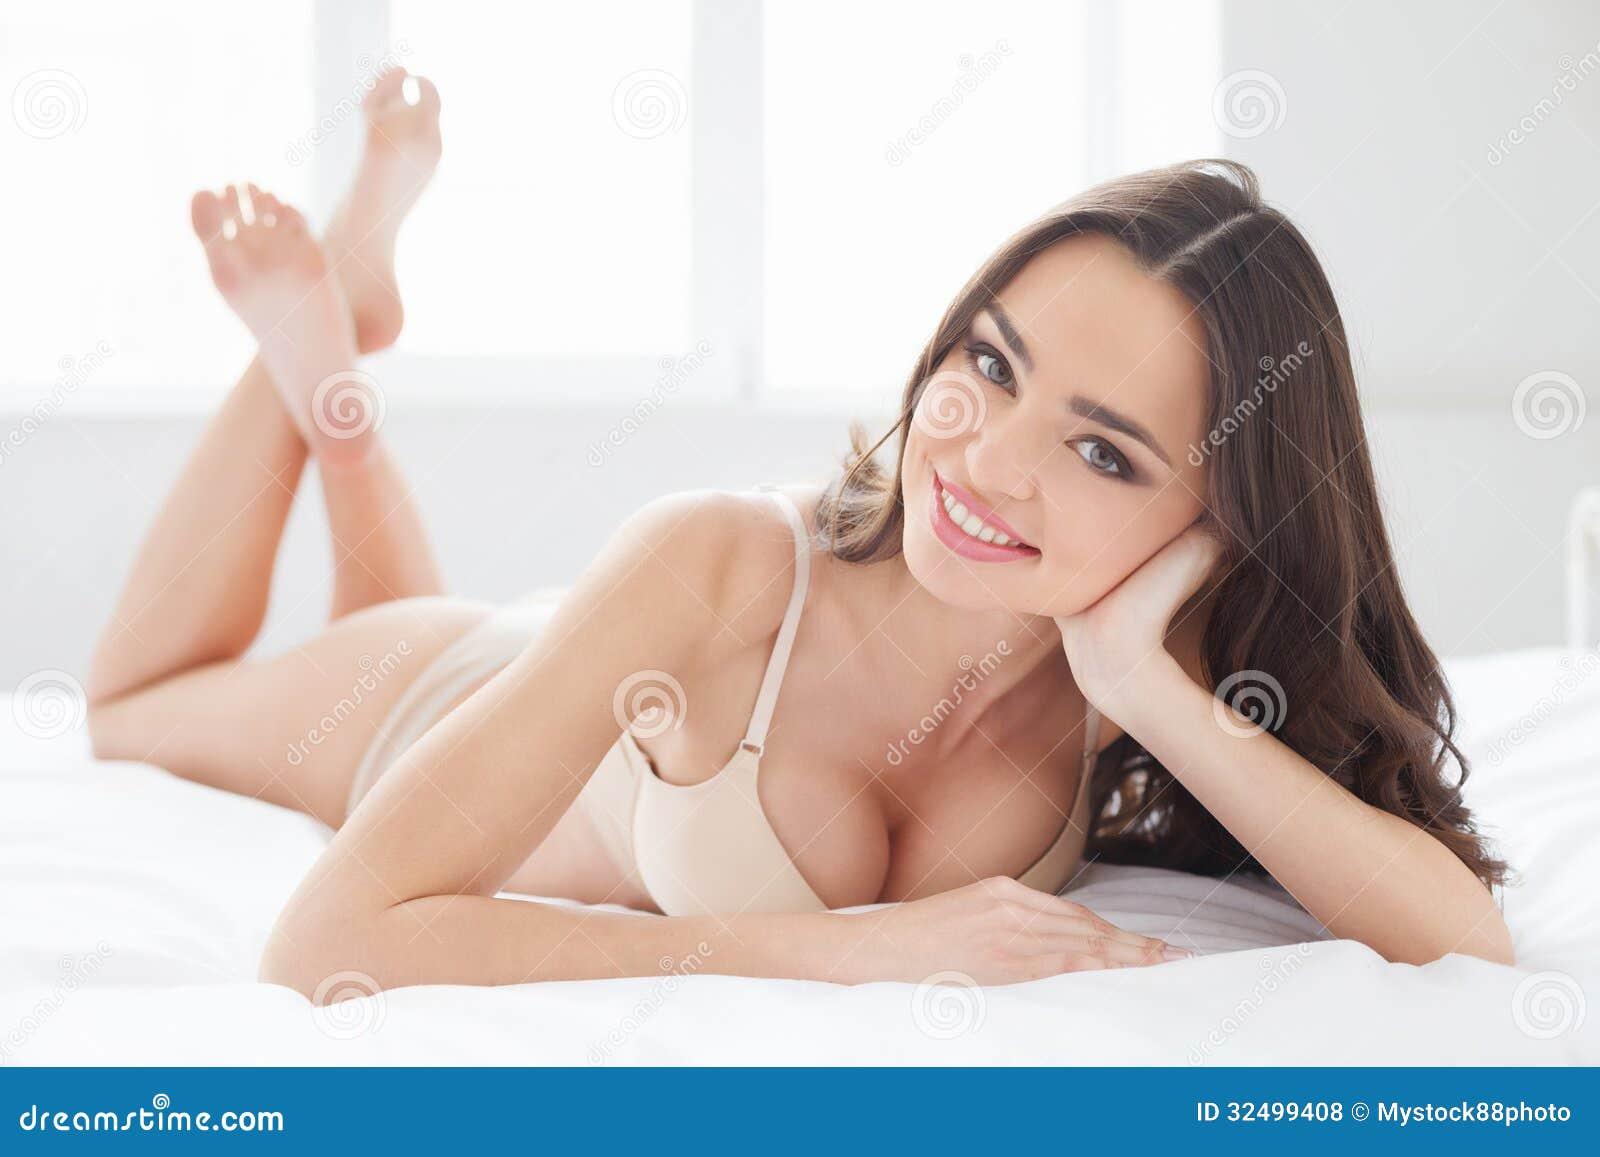 Monki girl sex picture